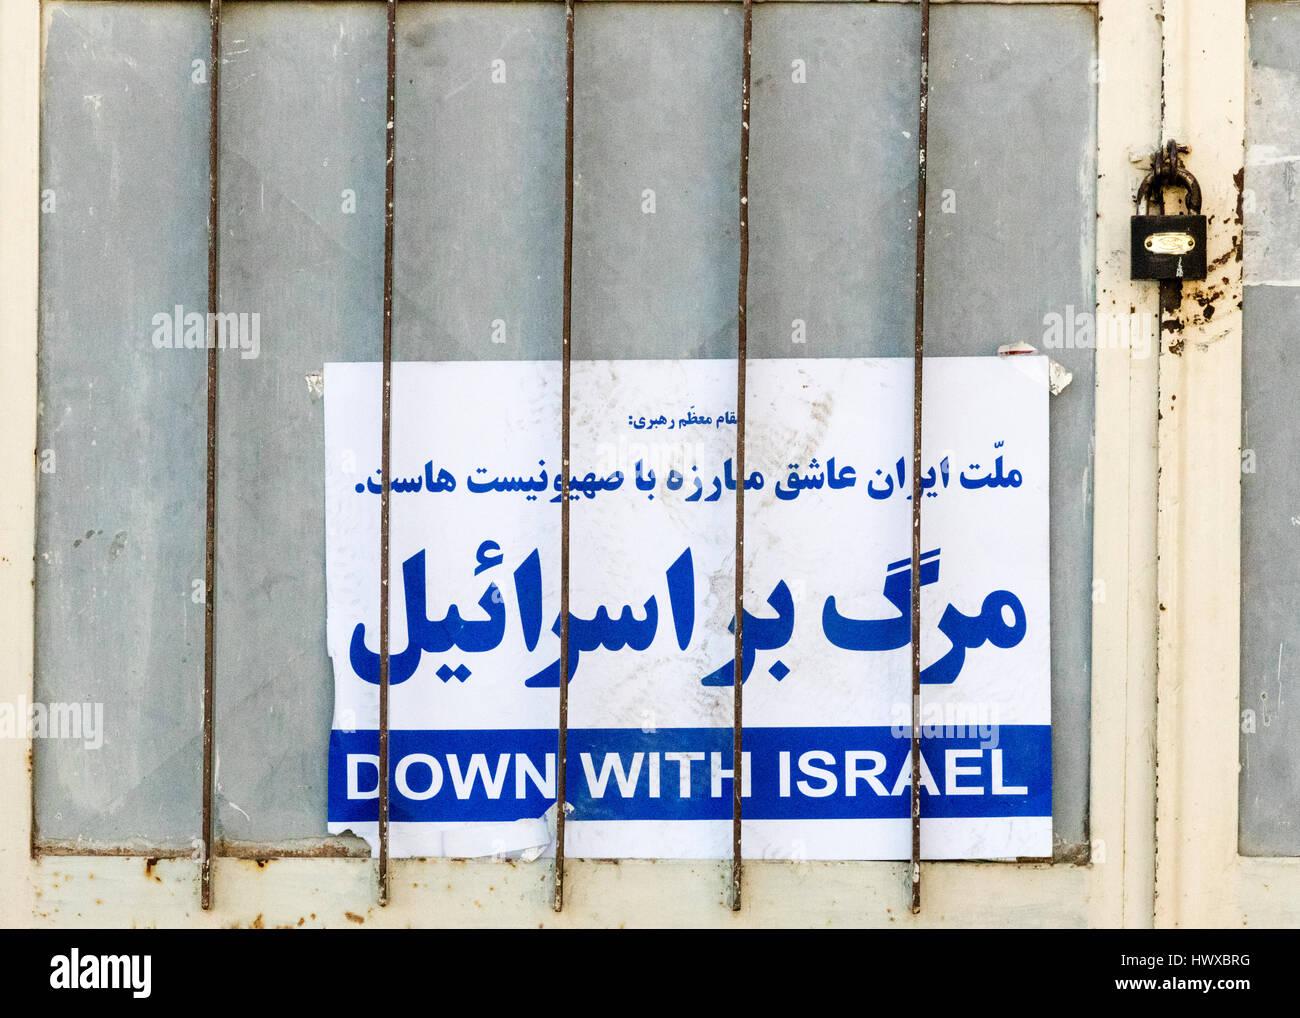 Anti-Israel poster near Imam Esmaeil & Isaiah Mausoleum - Stock Image